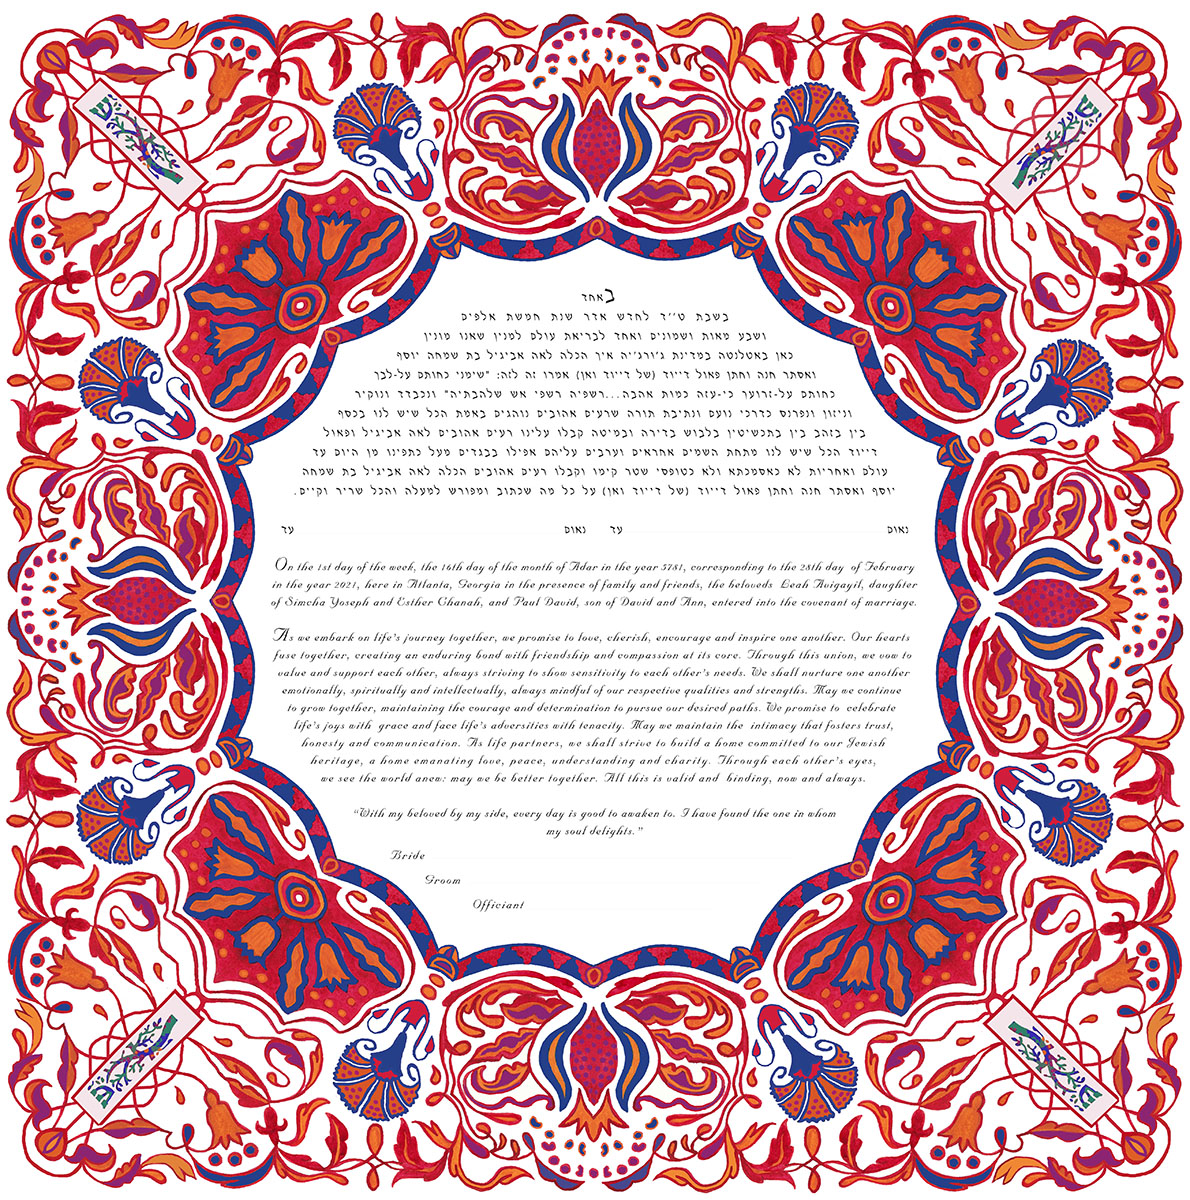 Pomegranate Ketubah Print with Mezuzahs